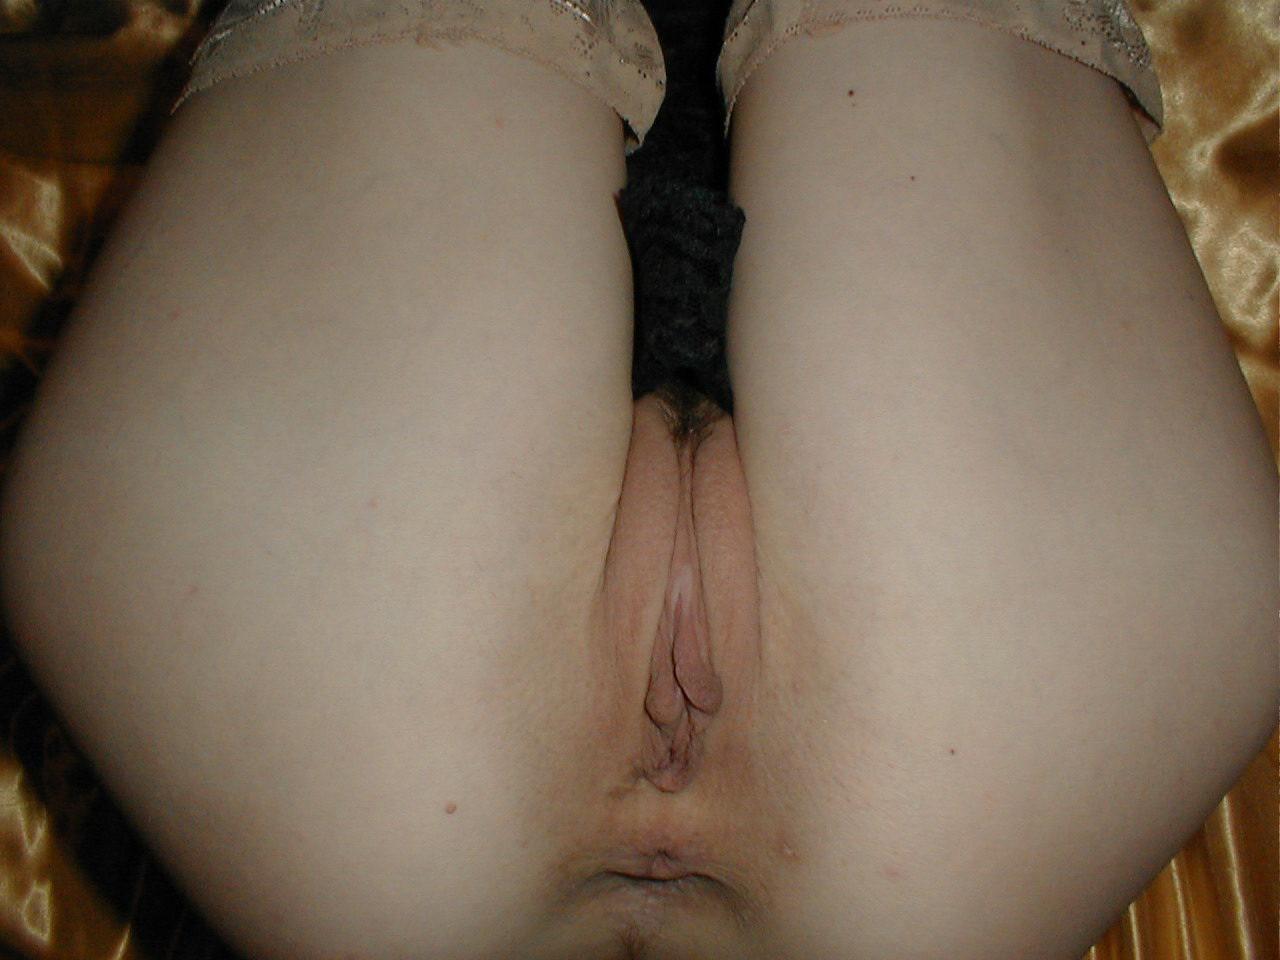 http://pbs-2.adult-empire.com/85/8570/020/pic/4.jpg